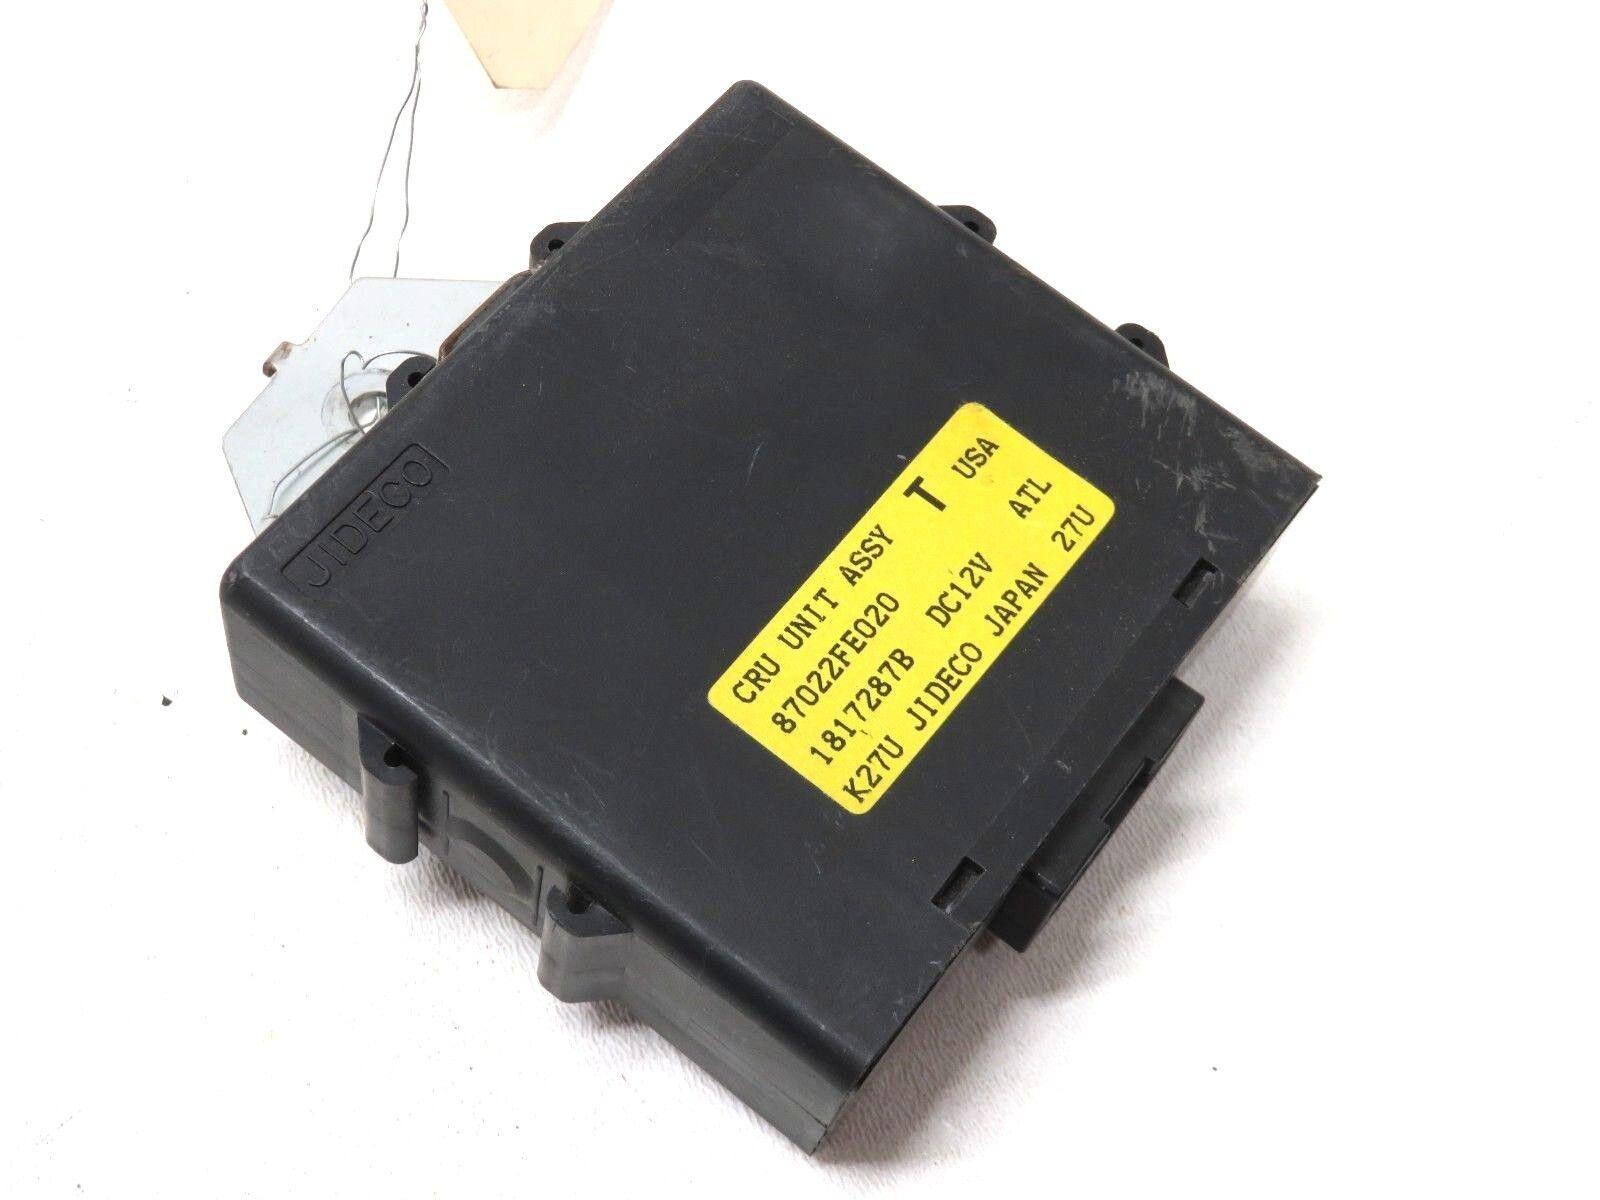 02-05 Subaru Impreza WRX Cruise Control Module Unit 87022FE020 Computer